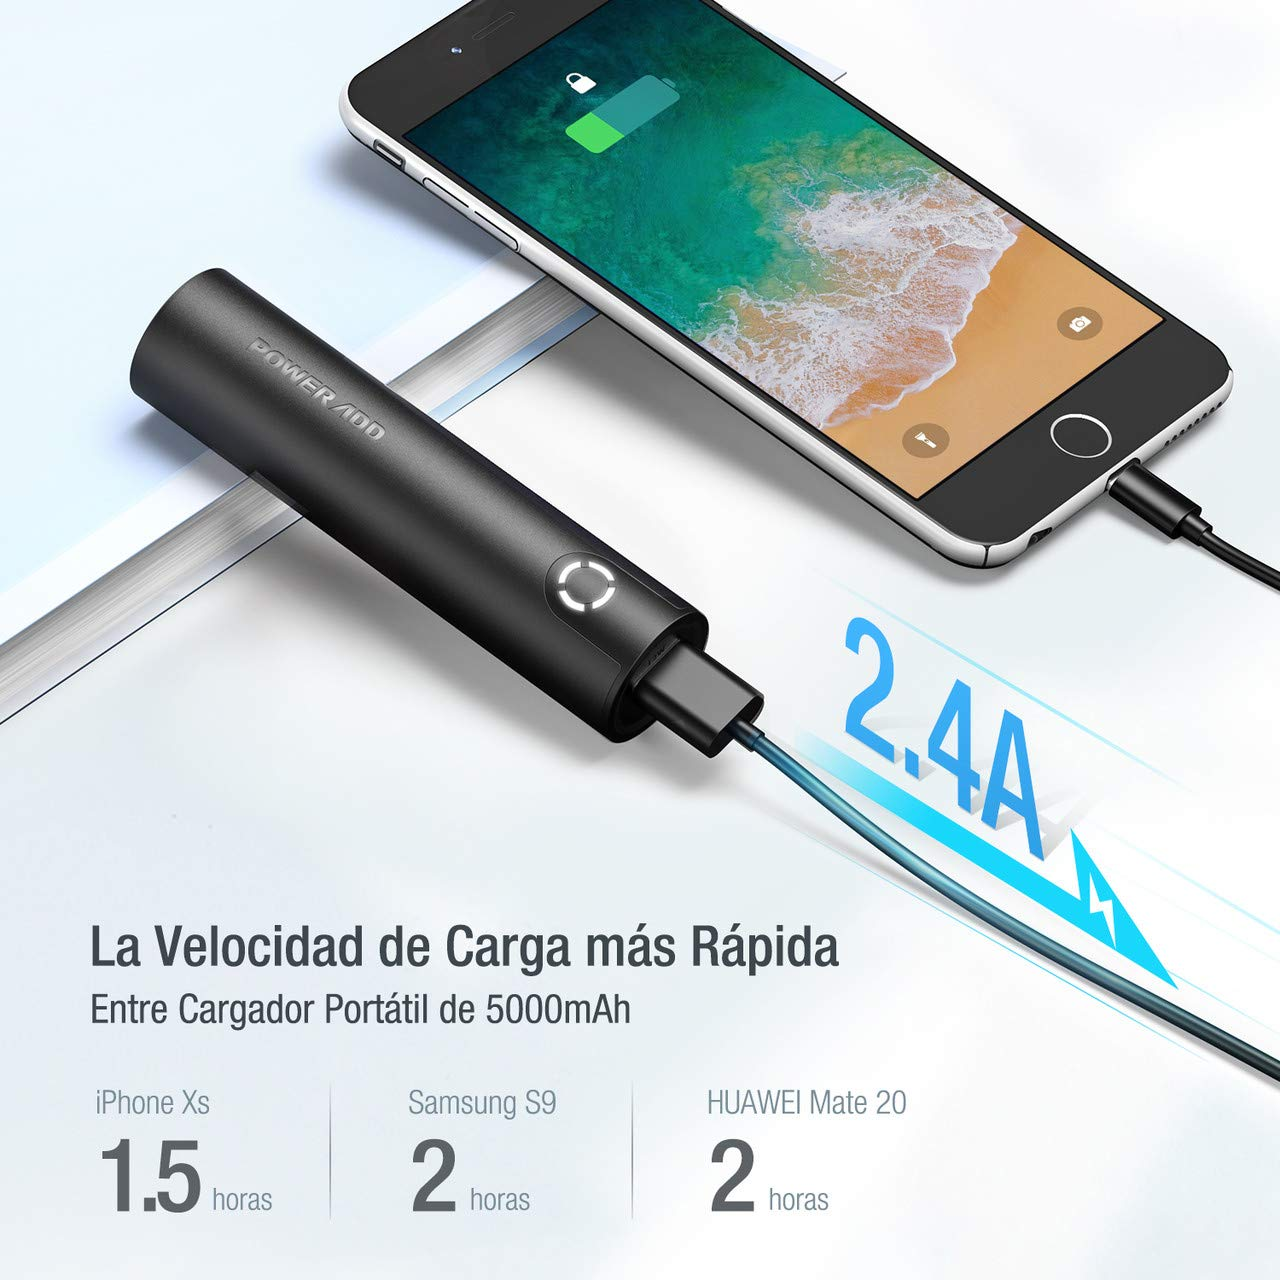 POWERADD Energy Cell 5000mAh Power Bank Cargador Portátil para iPhone,Samsung,Huawei y Más Dispositivos-Negro